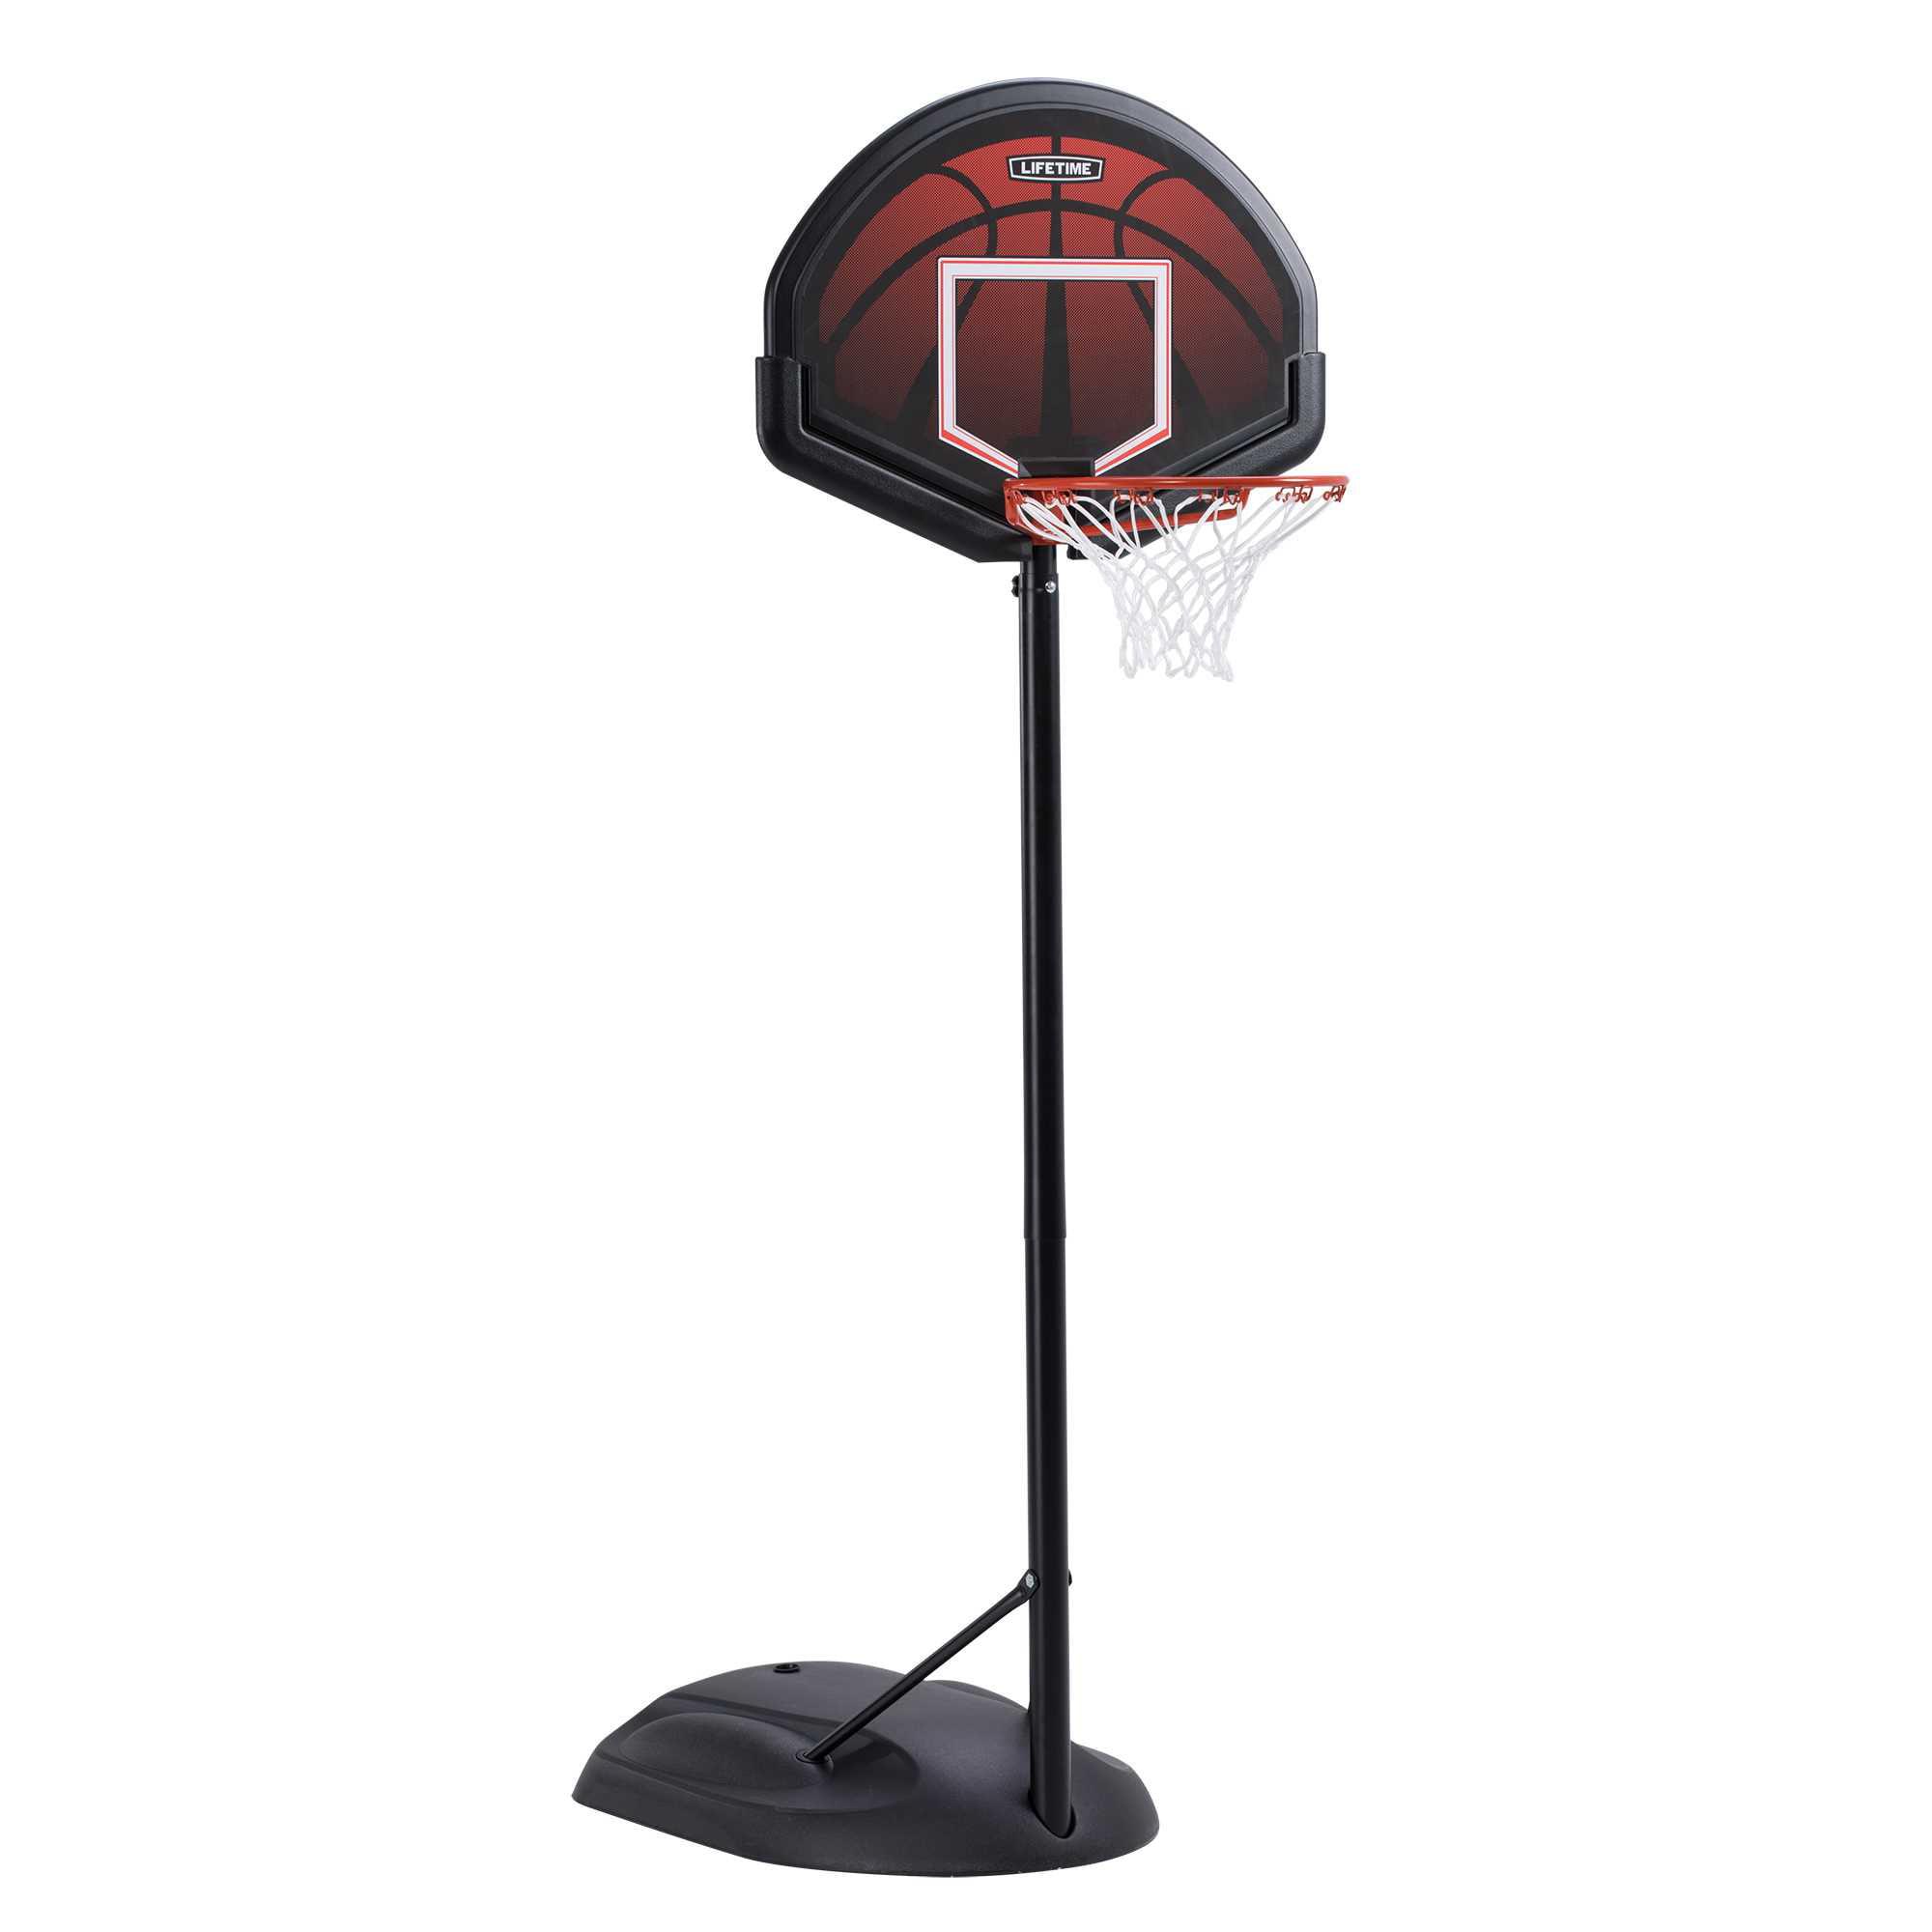 Lifetime Youth Basketball Telescopig Adjustment System.